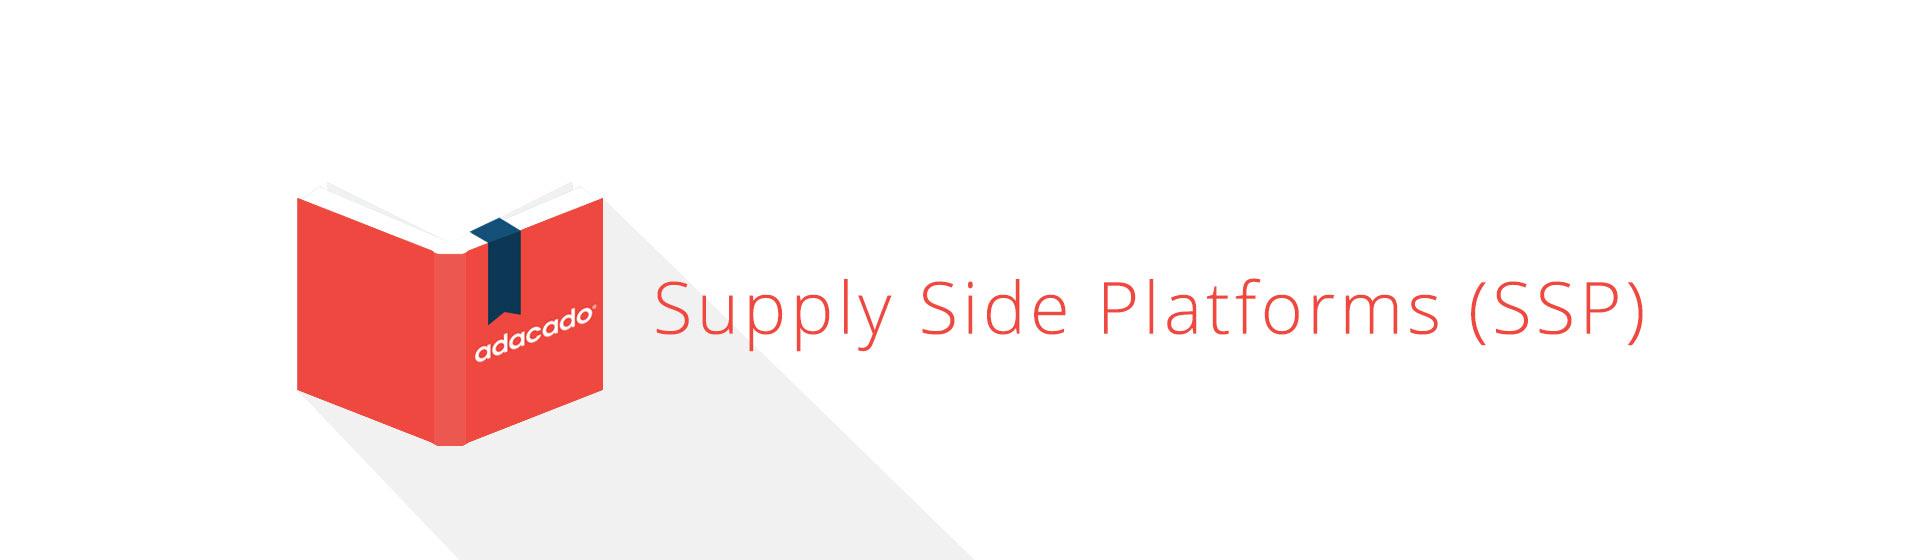 supply side platforms